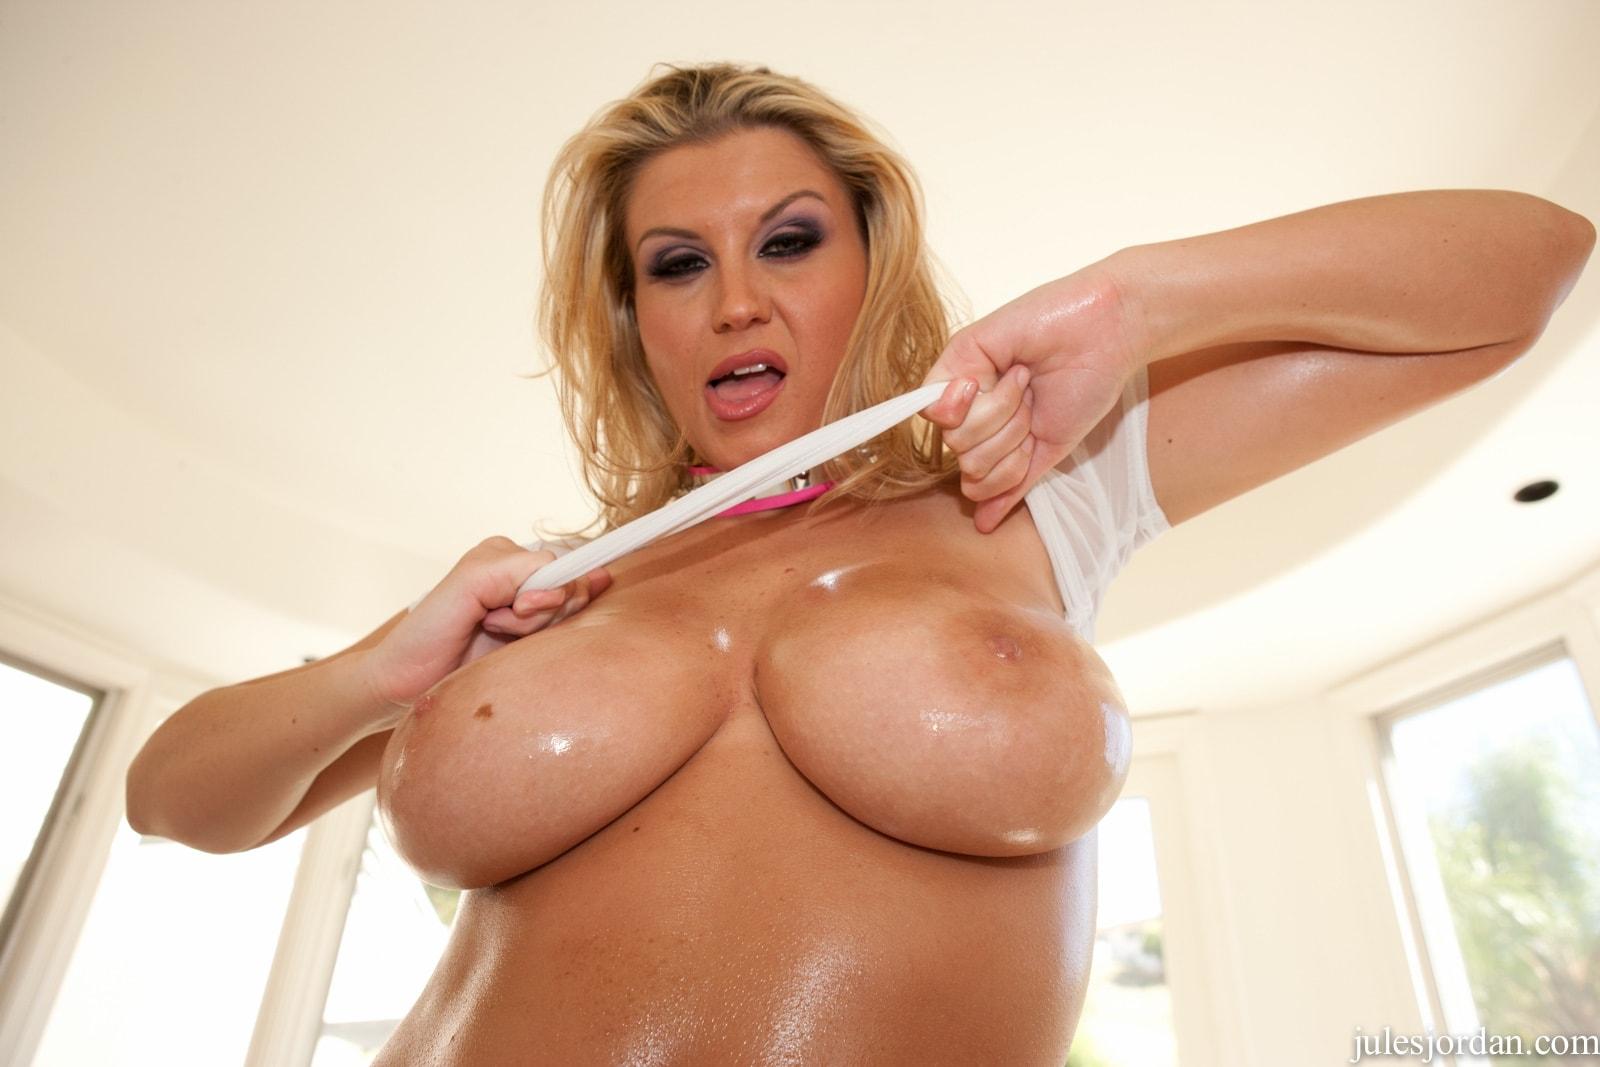 Jules Jordan 'Big Tits' starring Sara Stone (Photo 10)